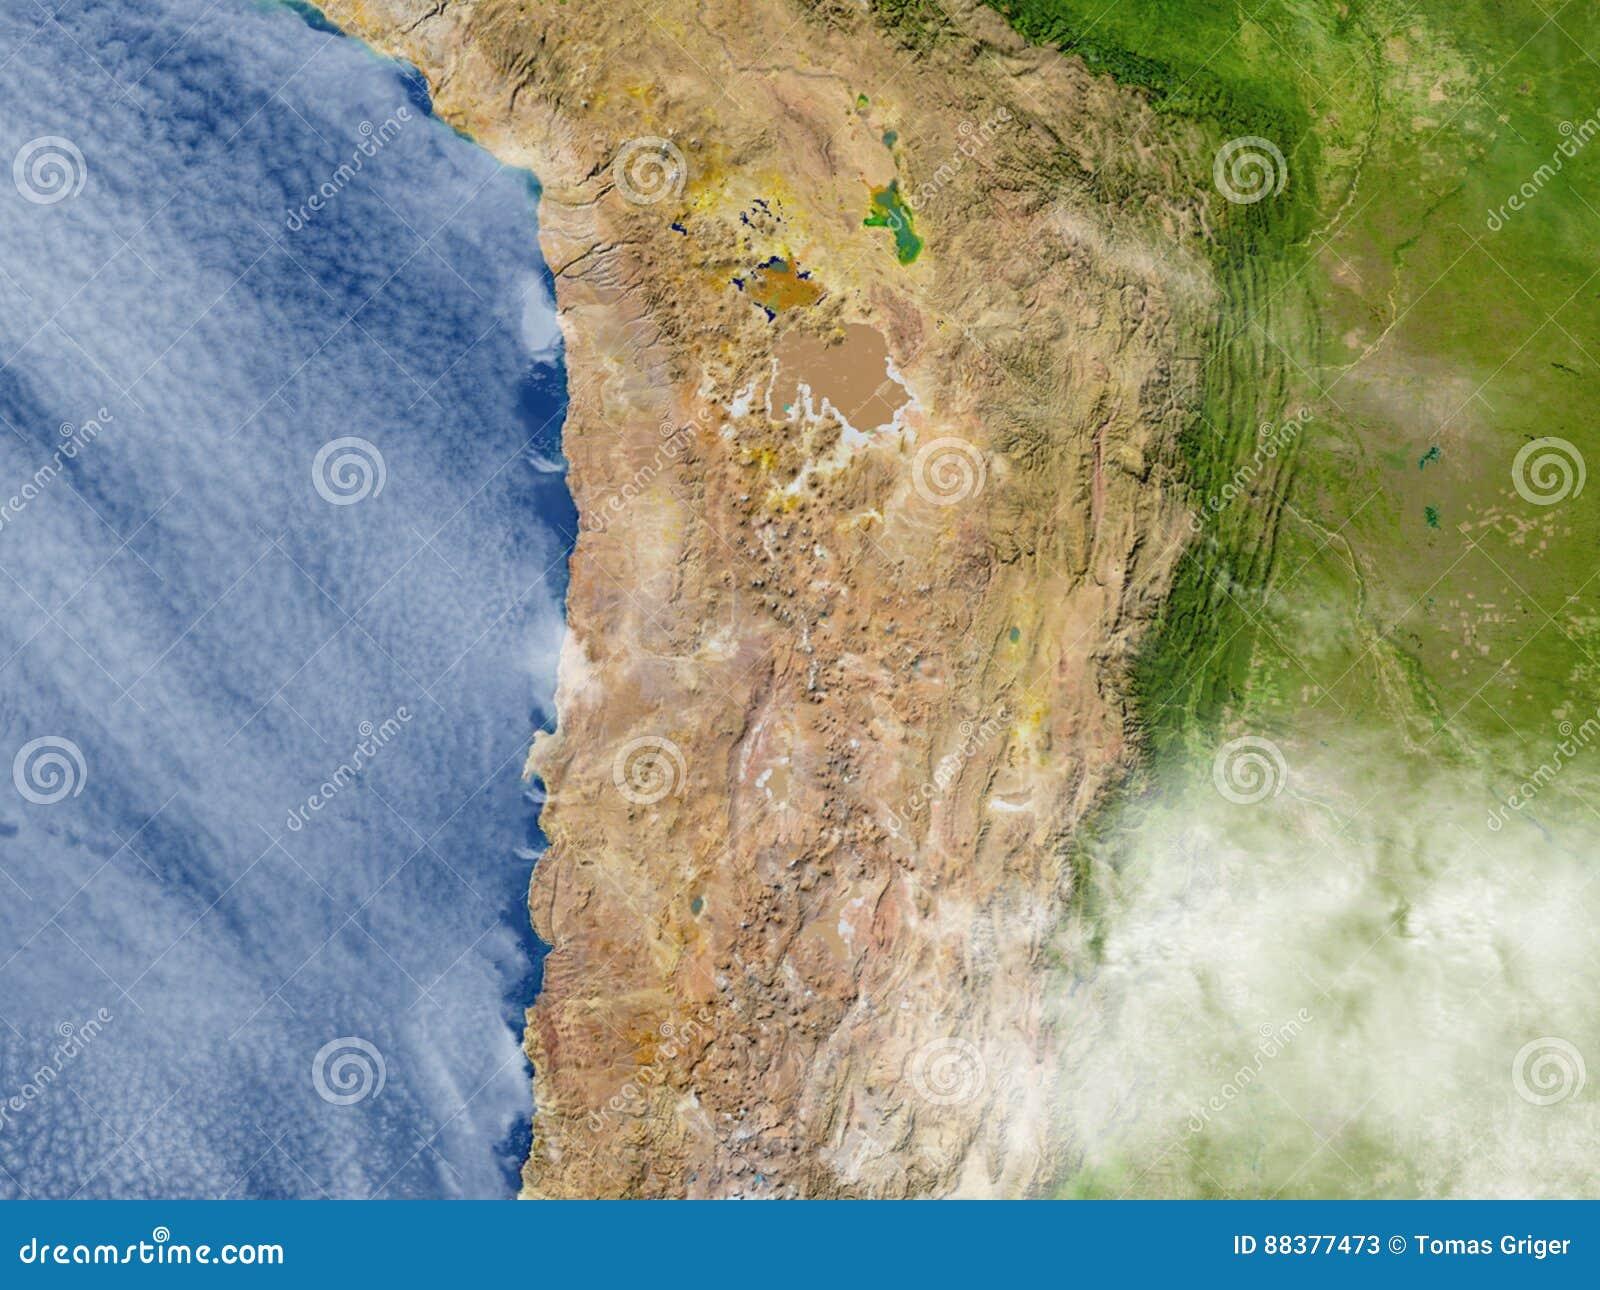 bolivia s altiplano and 150 lake titicaca copacabana and beyond lougheed vivien